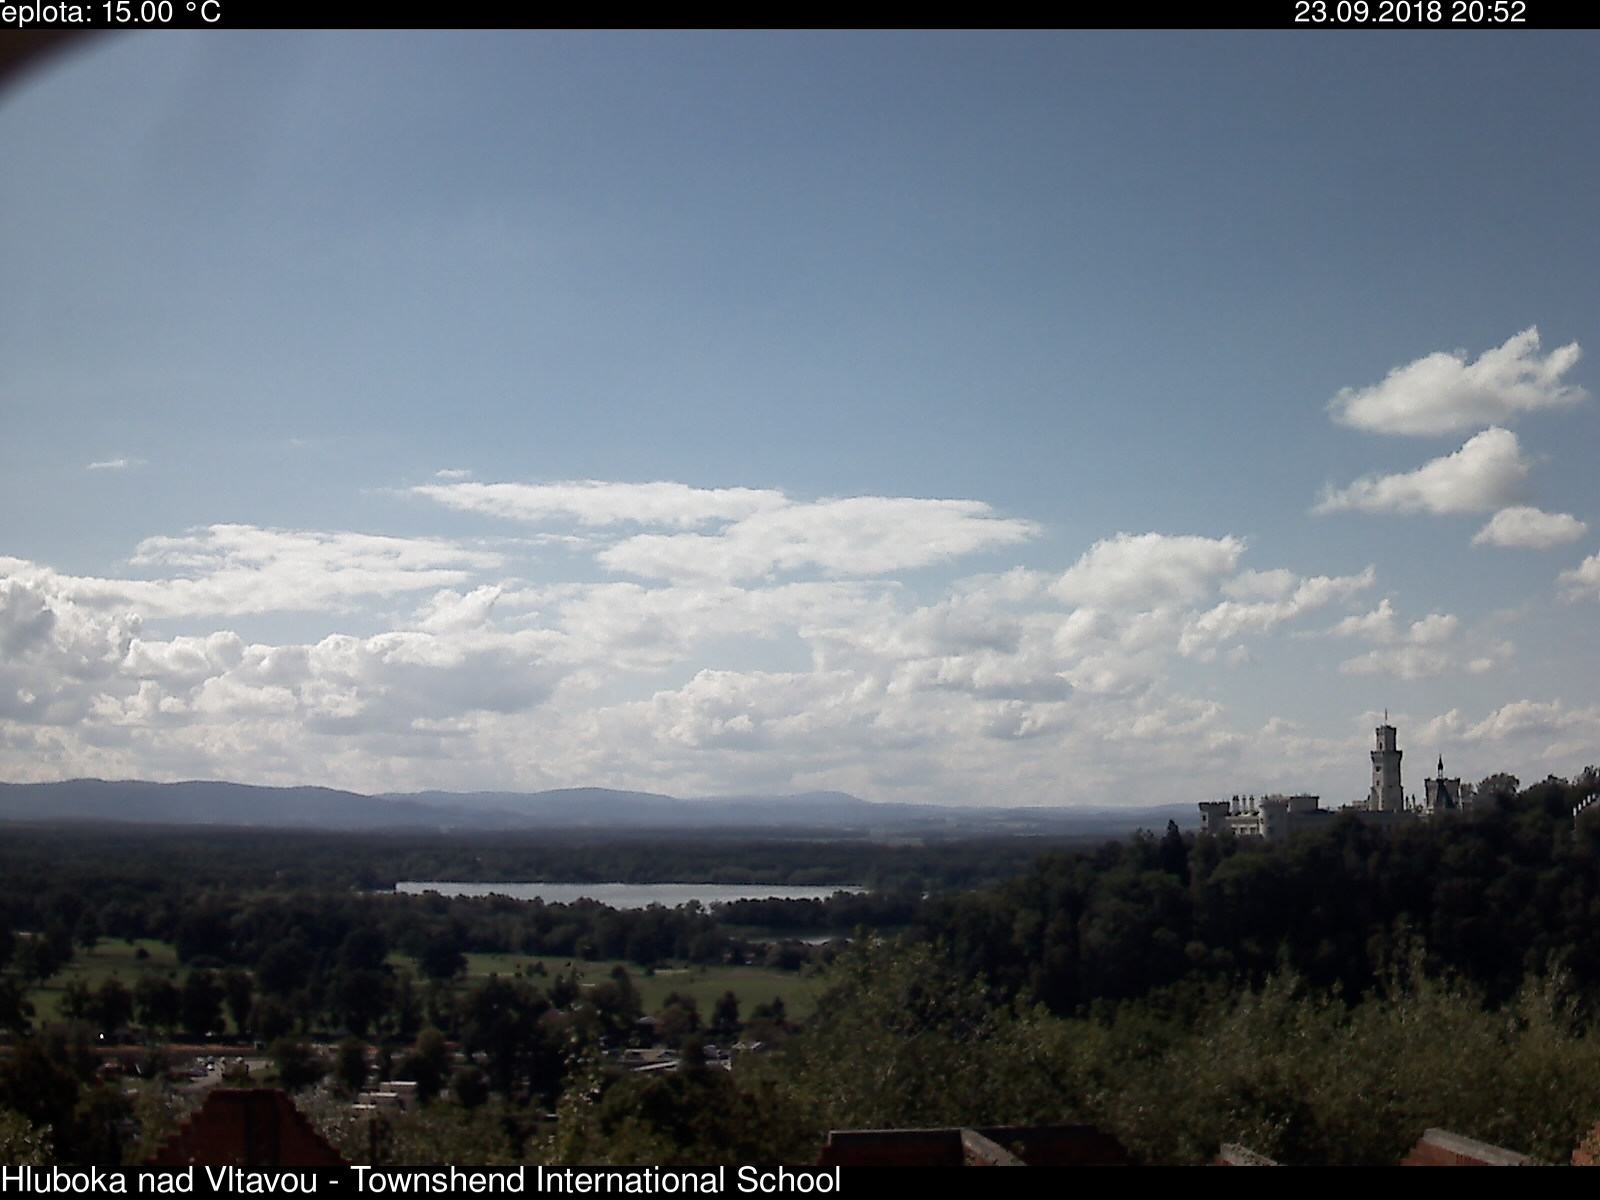 Webkamera Hluboká nad Vltavou